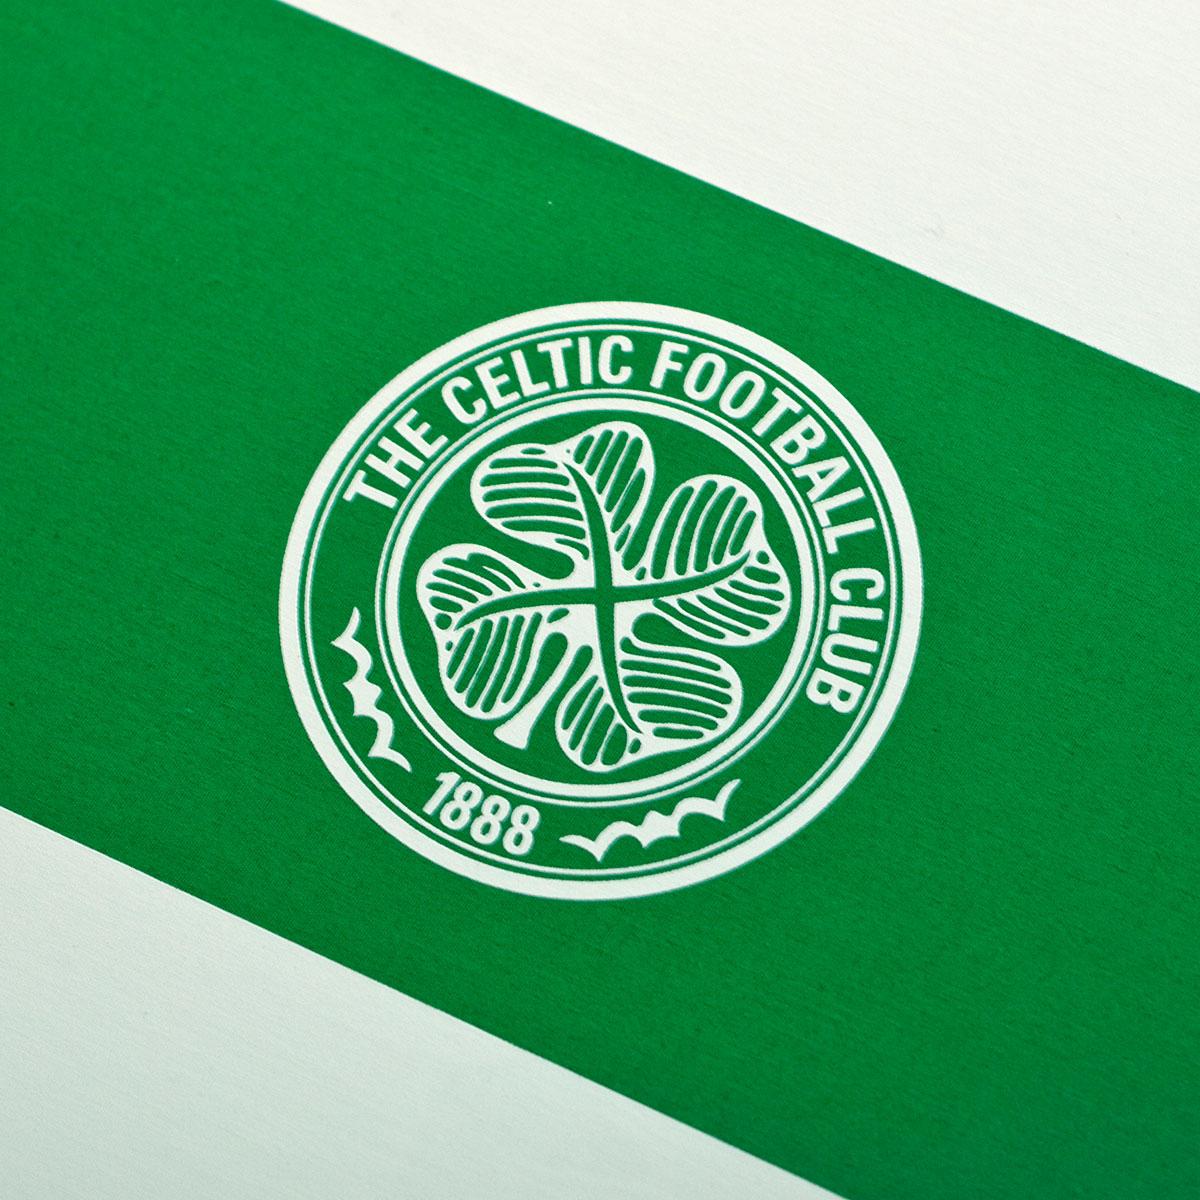 Celtic Football Club book design